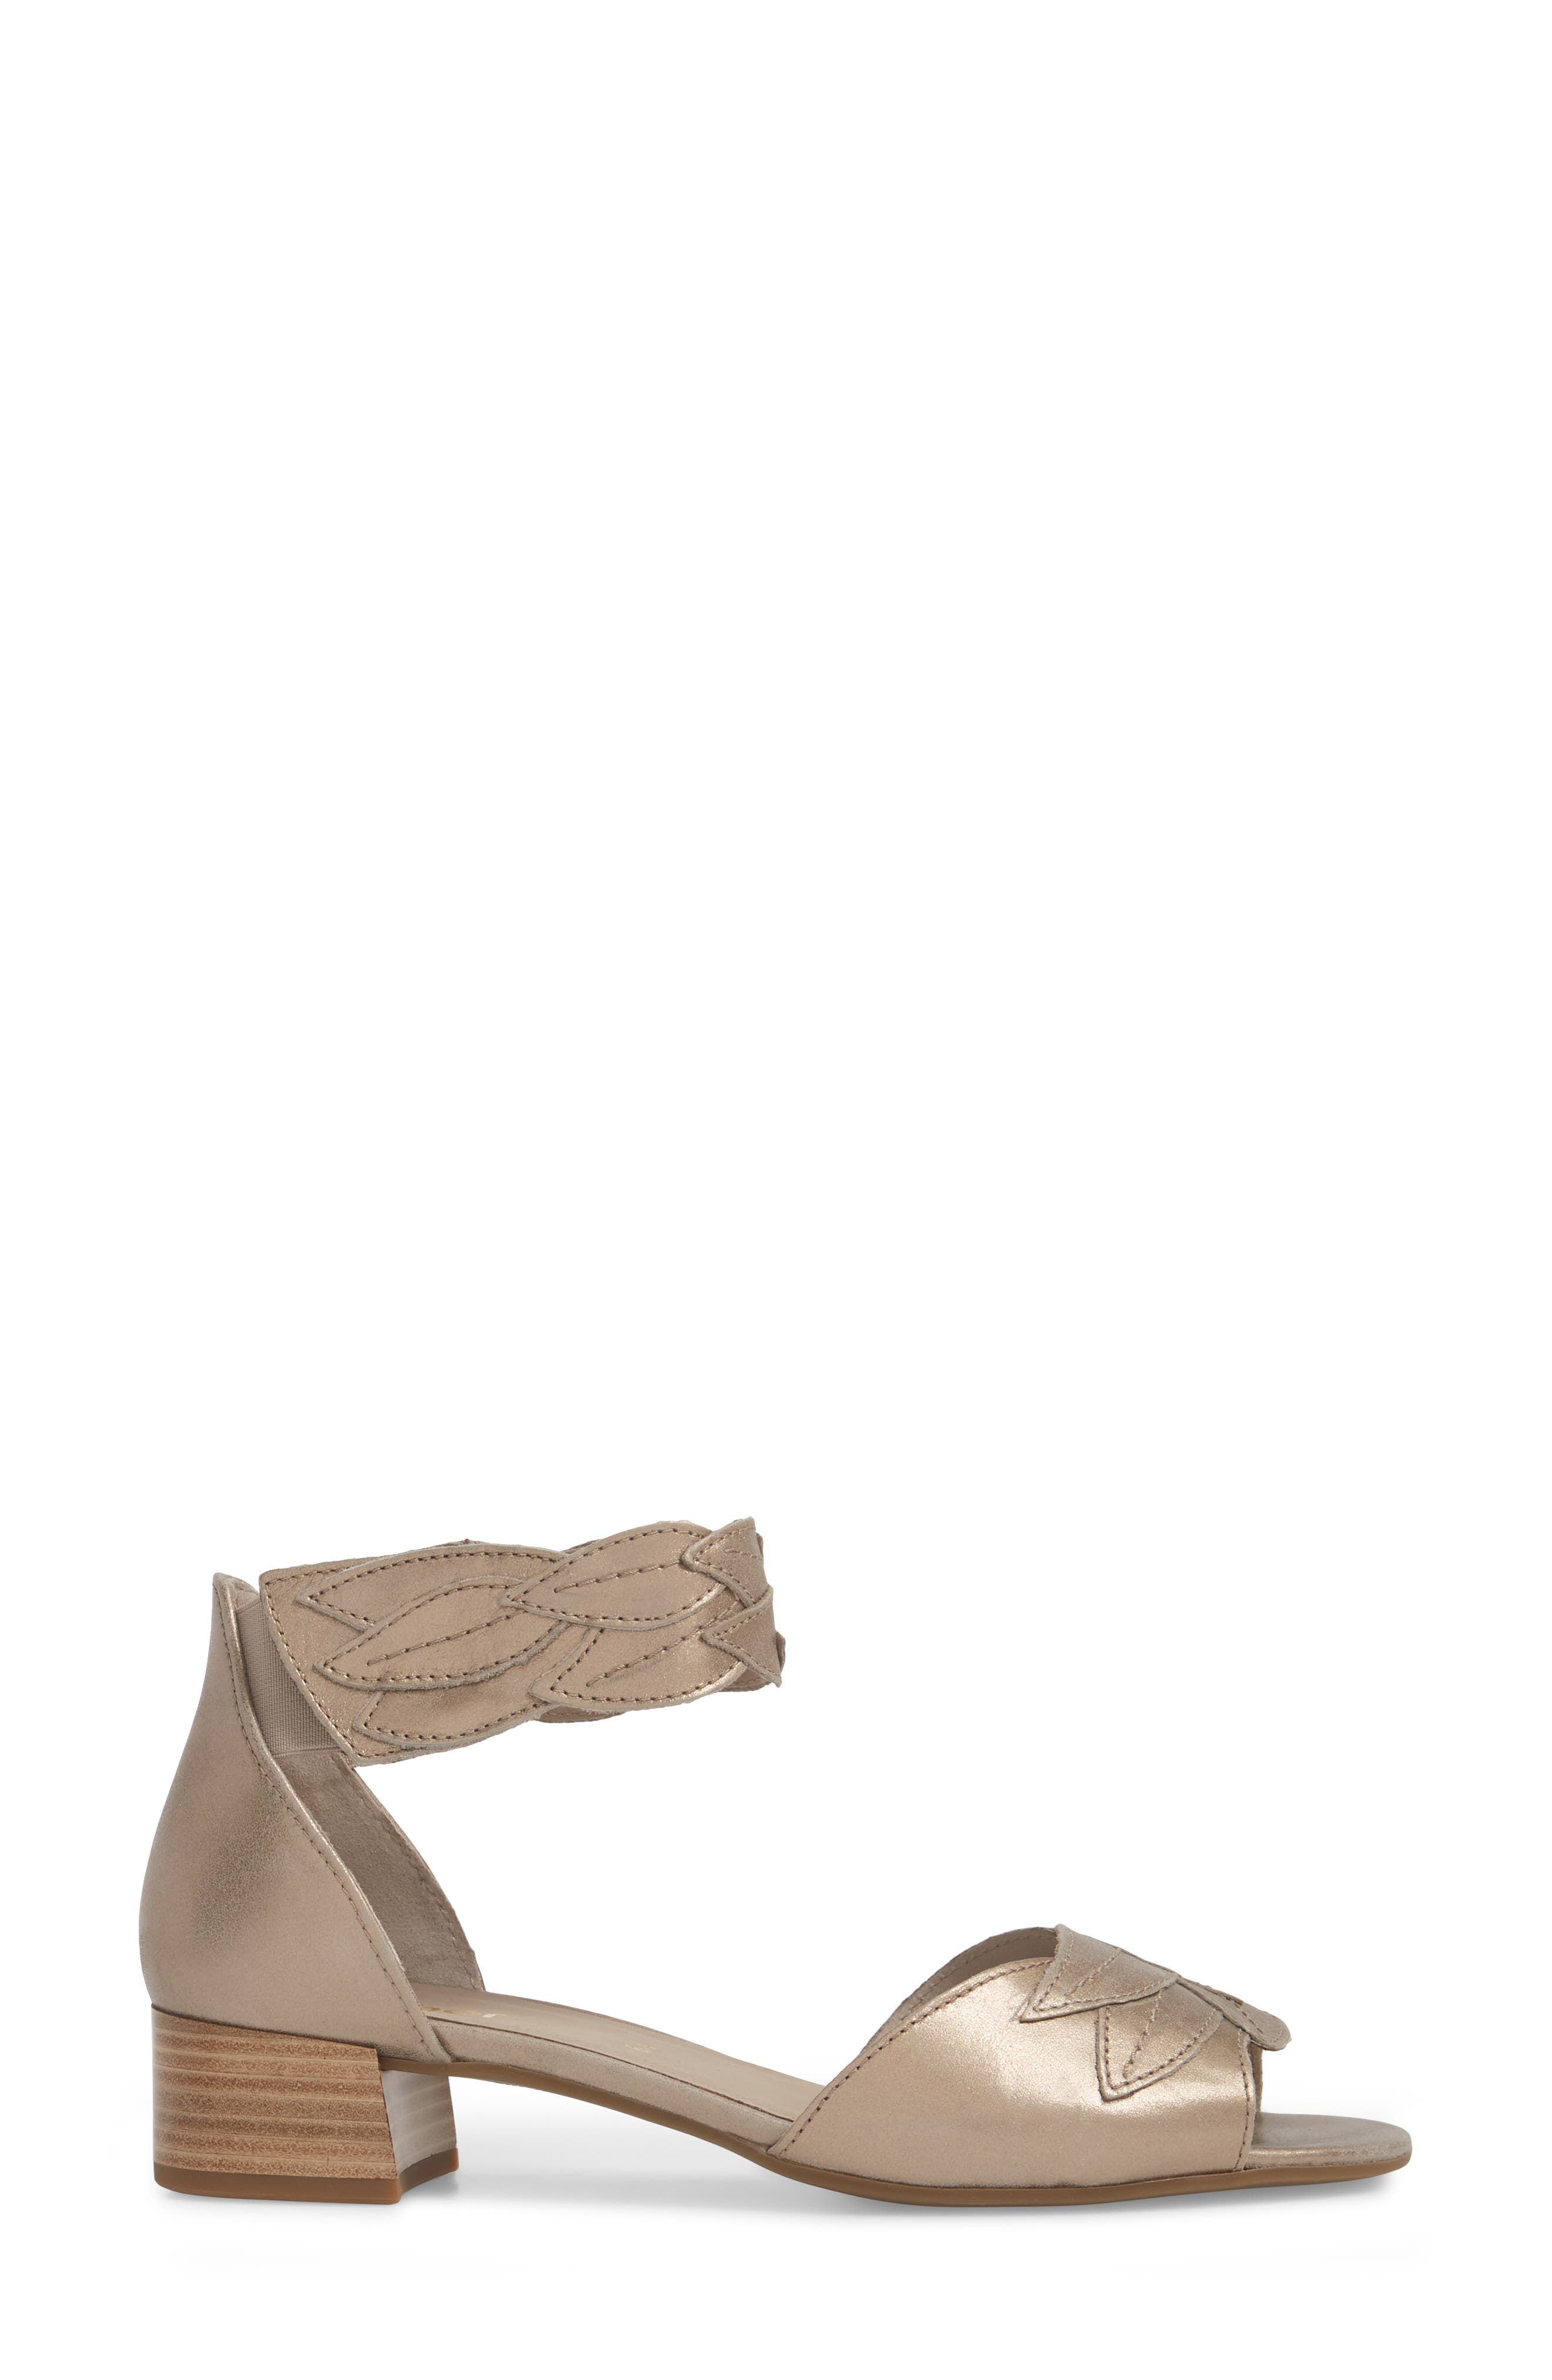 Leaf Ankle Strap Sandal,                             Alternate thumbnail 3, color,                             BEIGE METALLIC LEATHER